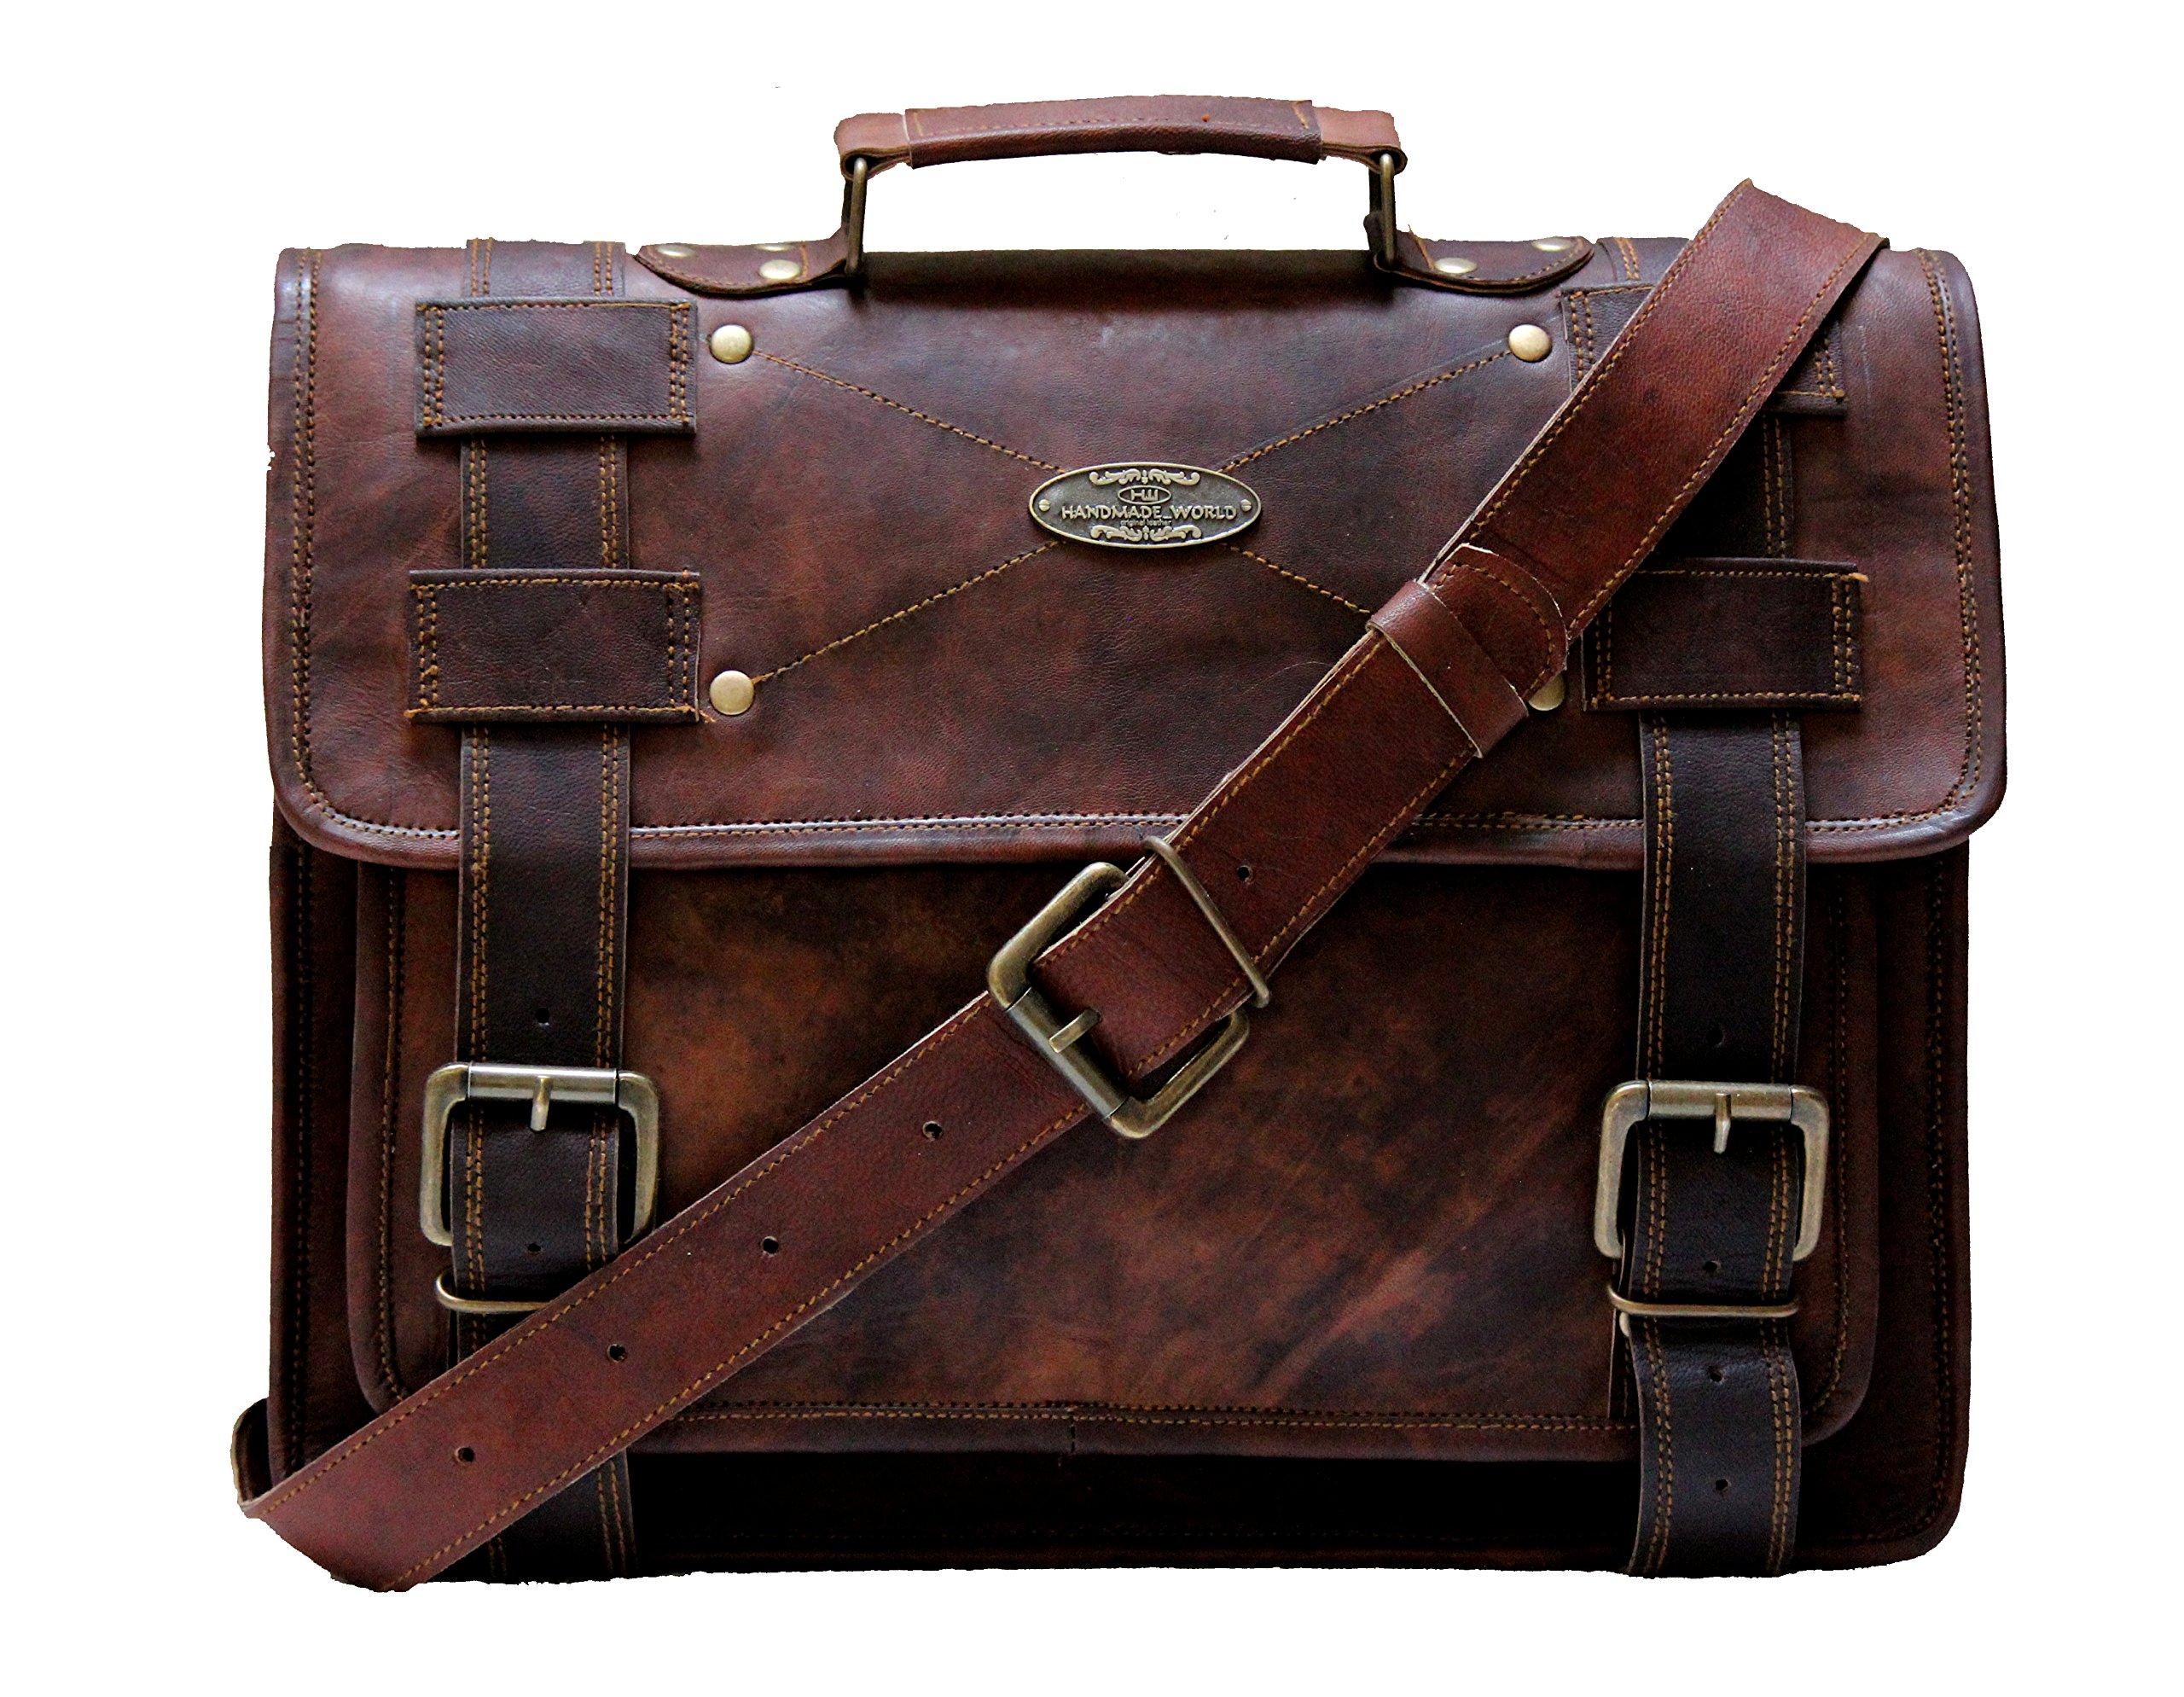 Handmade world Leather Messenger Bags 15